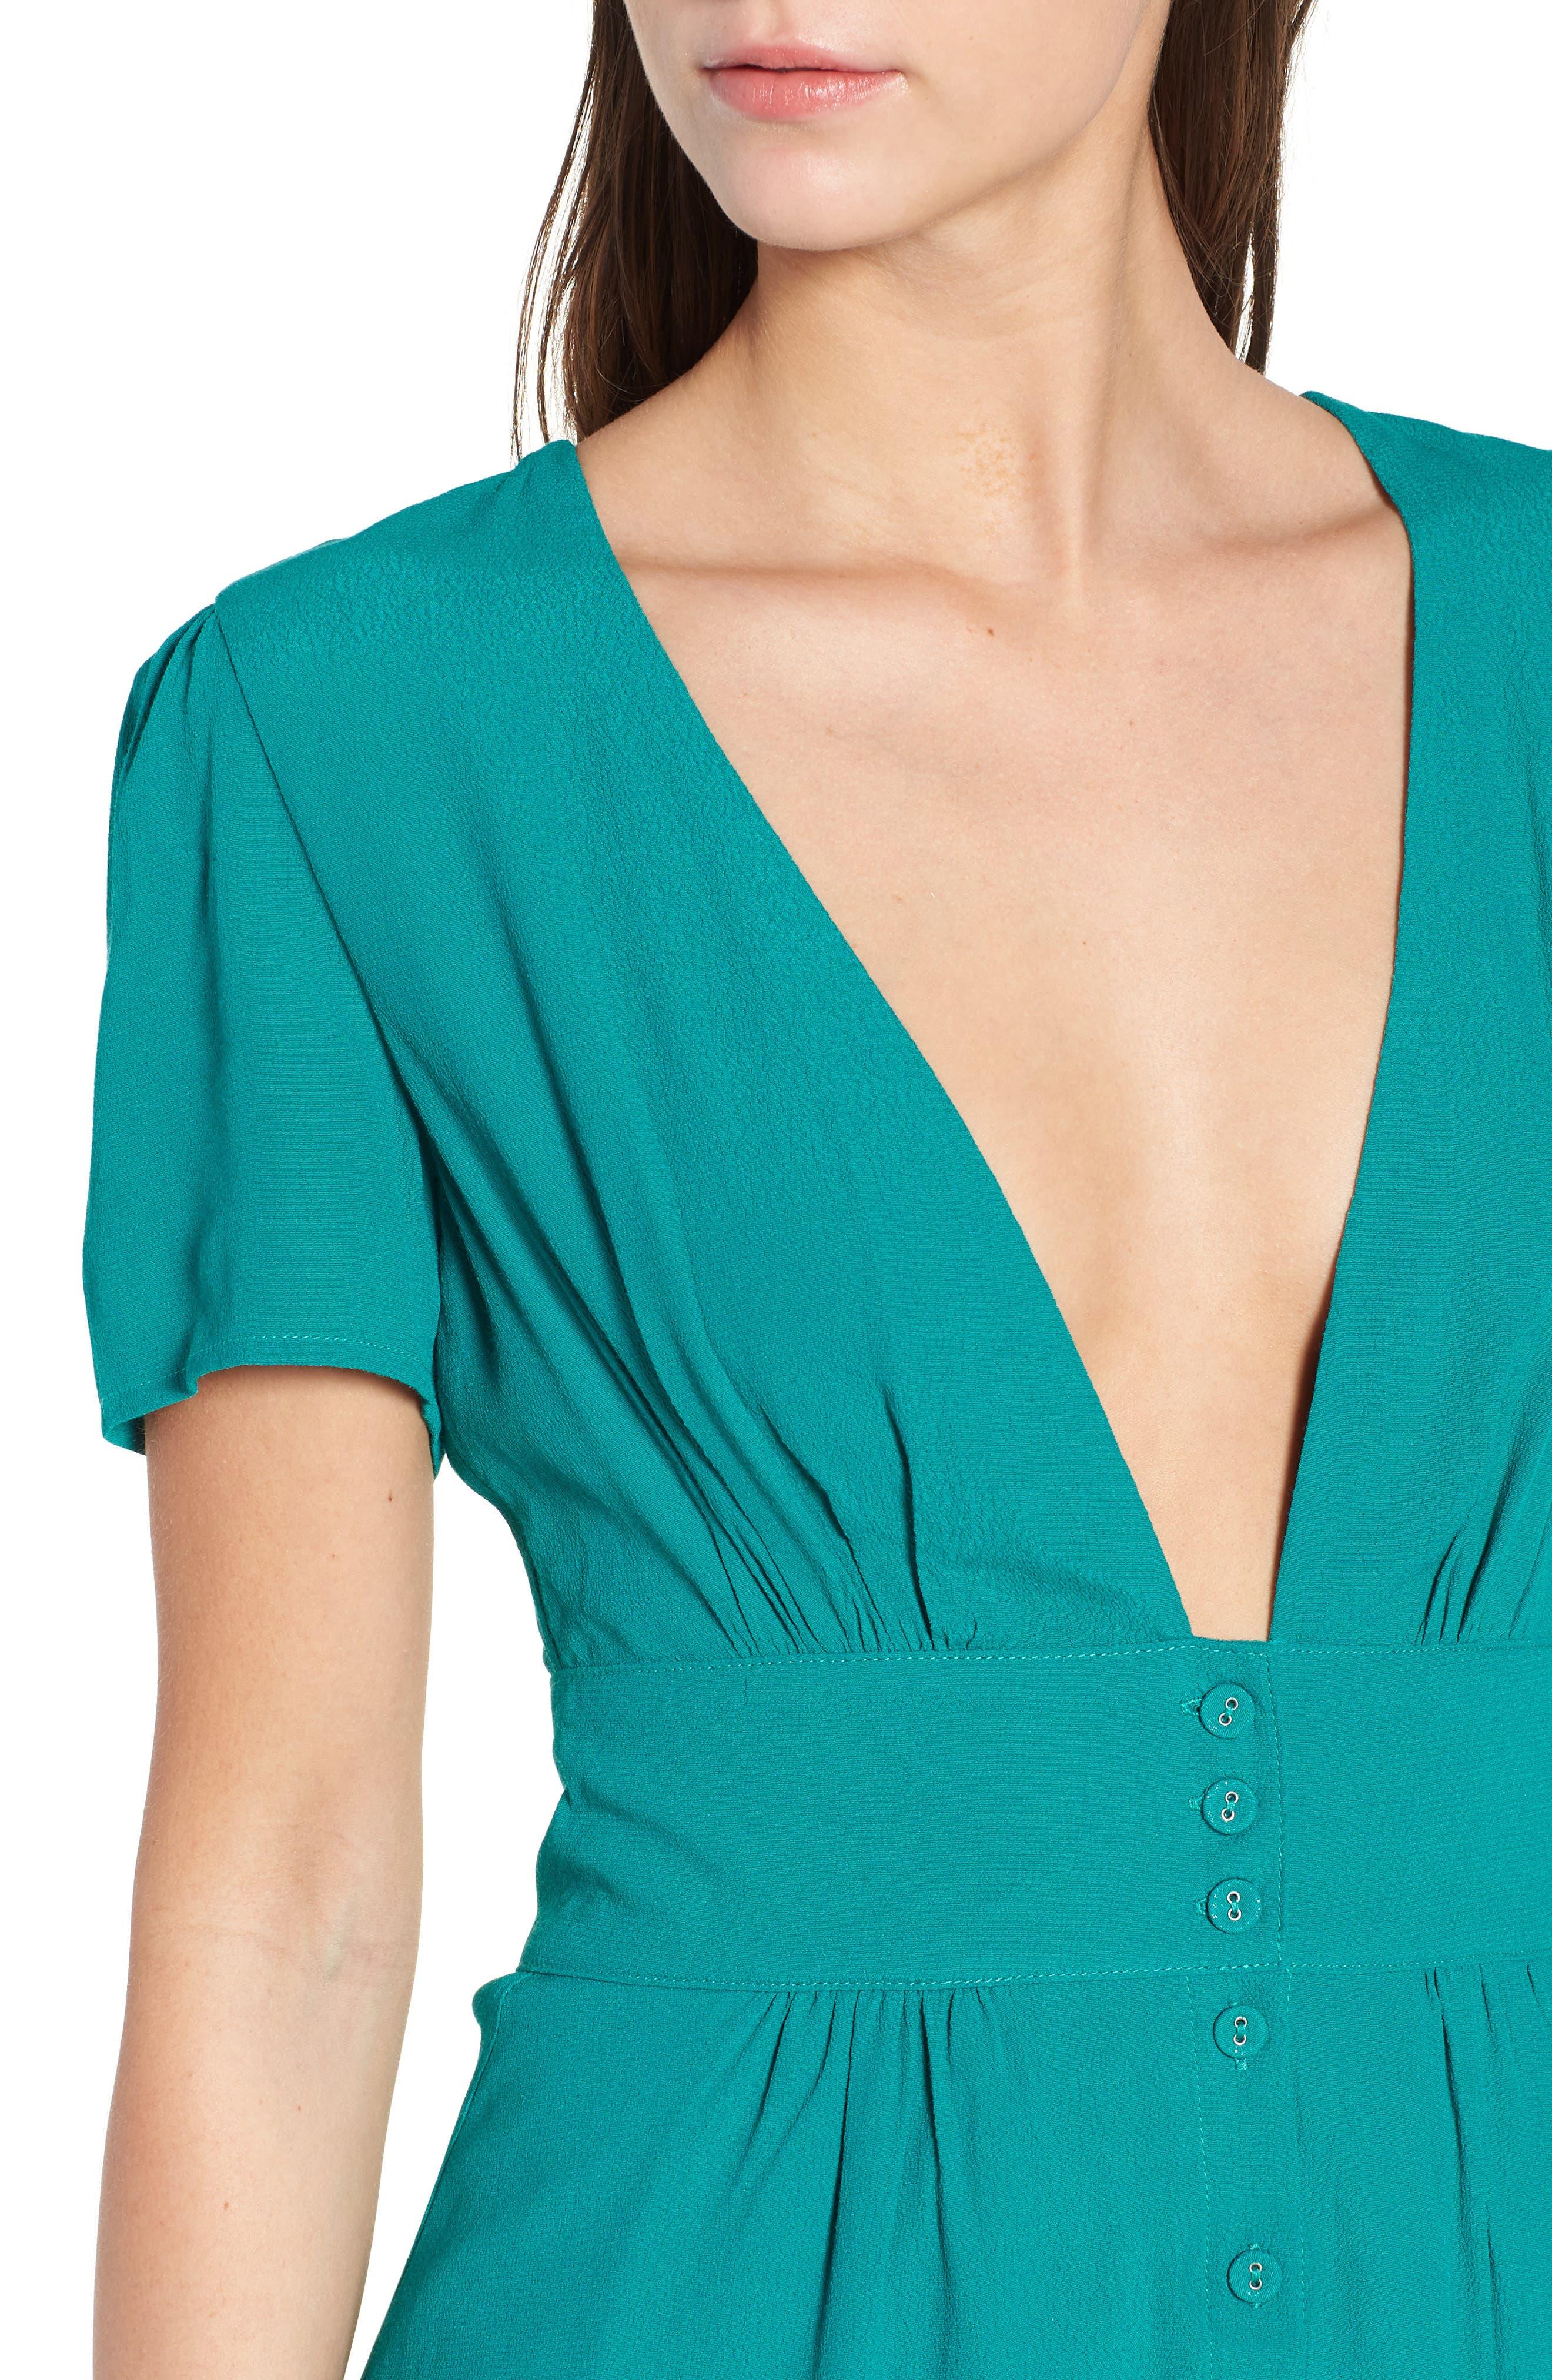 Verdera Plunging Minidress,                             Alternate thumbnail 6, color,                             Green